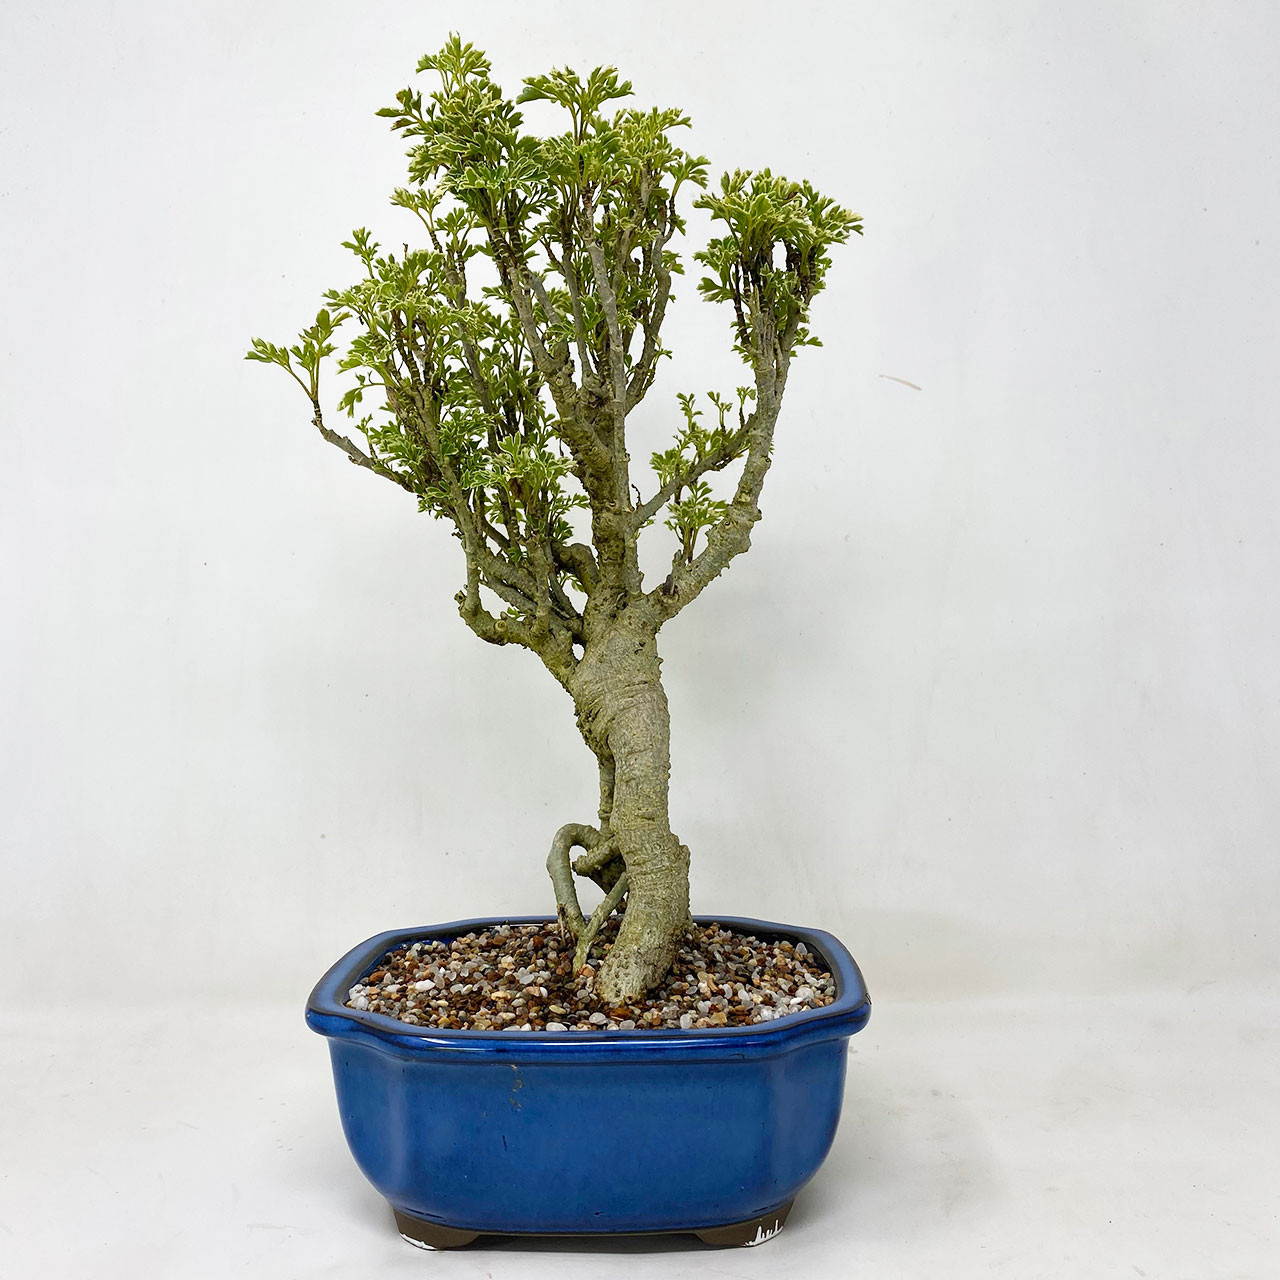 Ming Aralia Bonsai Tree Bonsai Outlet Tweb755